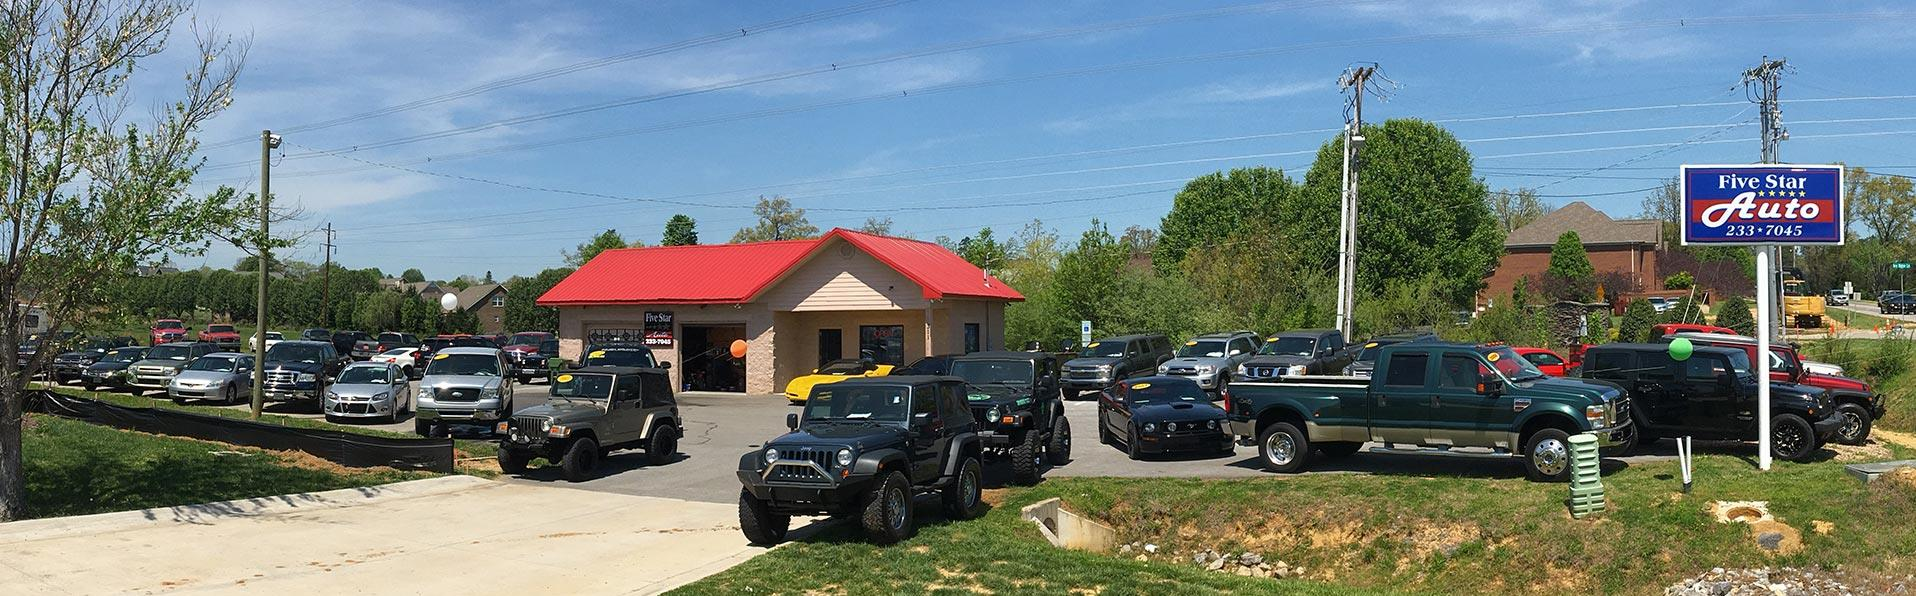 Maryville Auto Sales >> Used Cars Maryville Tn Used Cars Trucks Tn Five Star Auto Llc